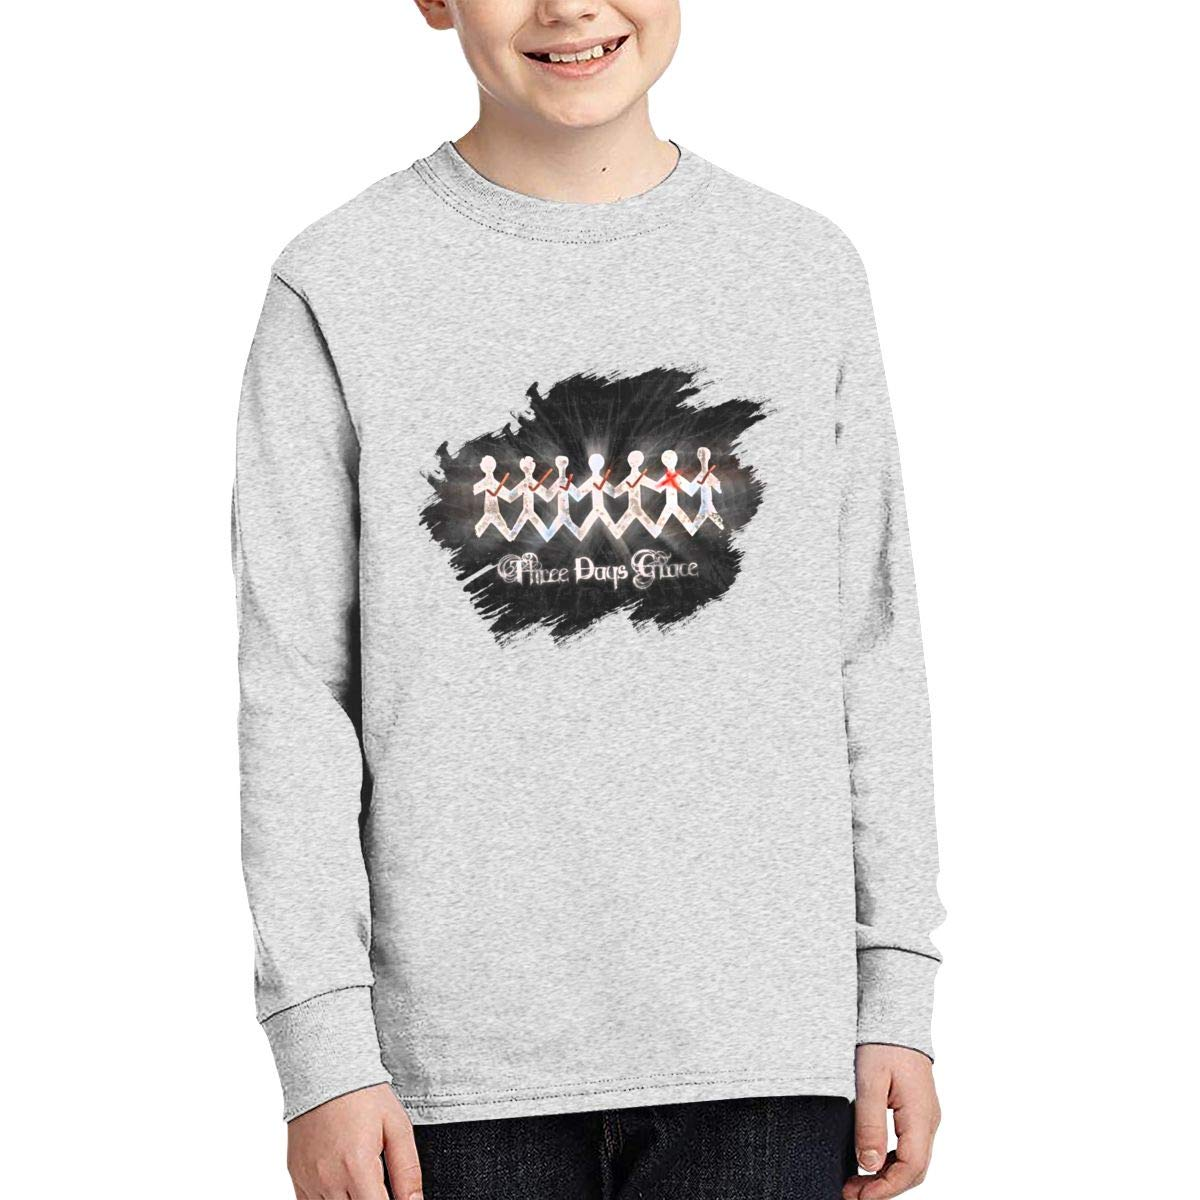 HangHisi Three Days Grace Boys /& Girls O Neck Regular Style Tee Long Sleeve T Shirt Leisure Black